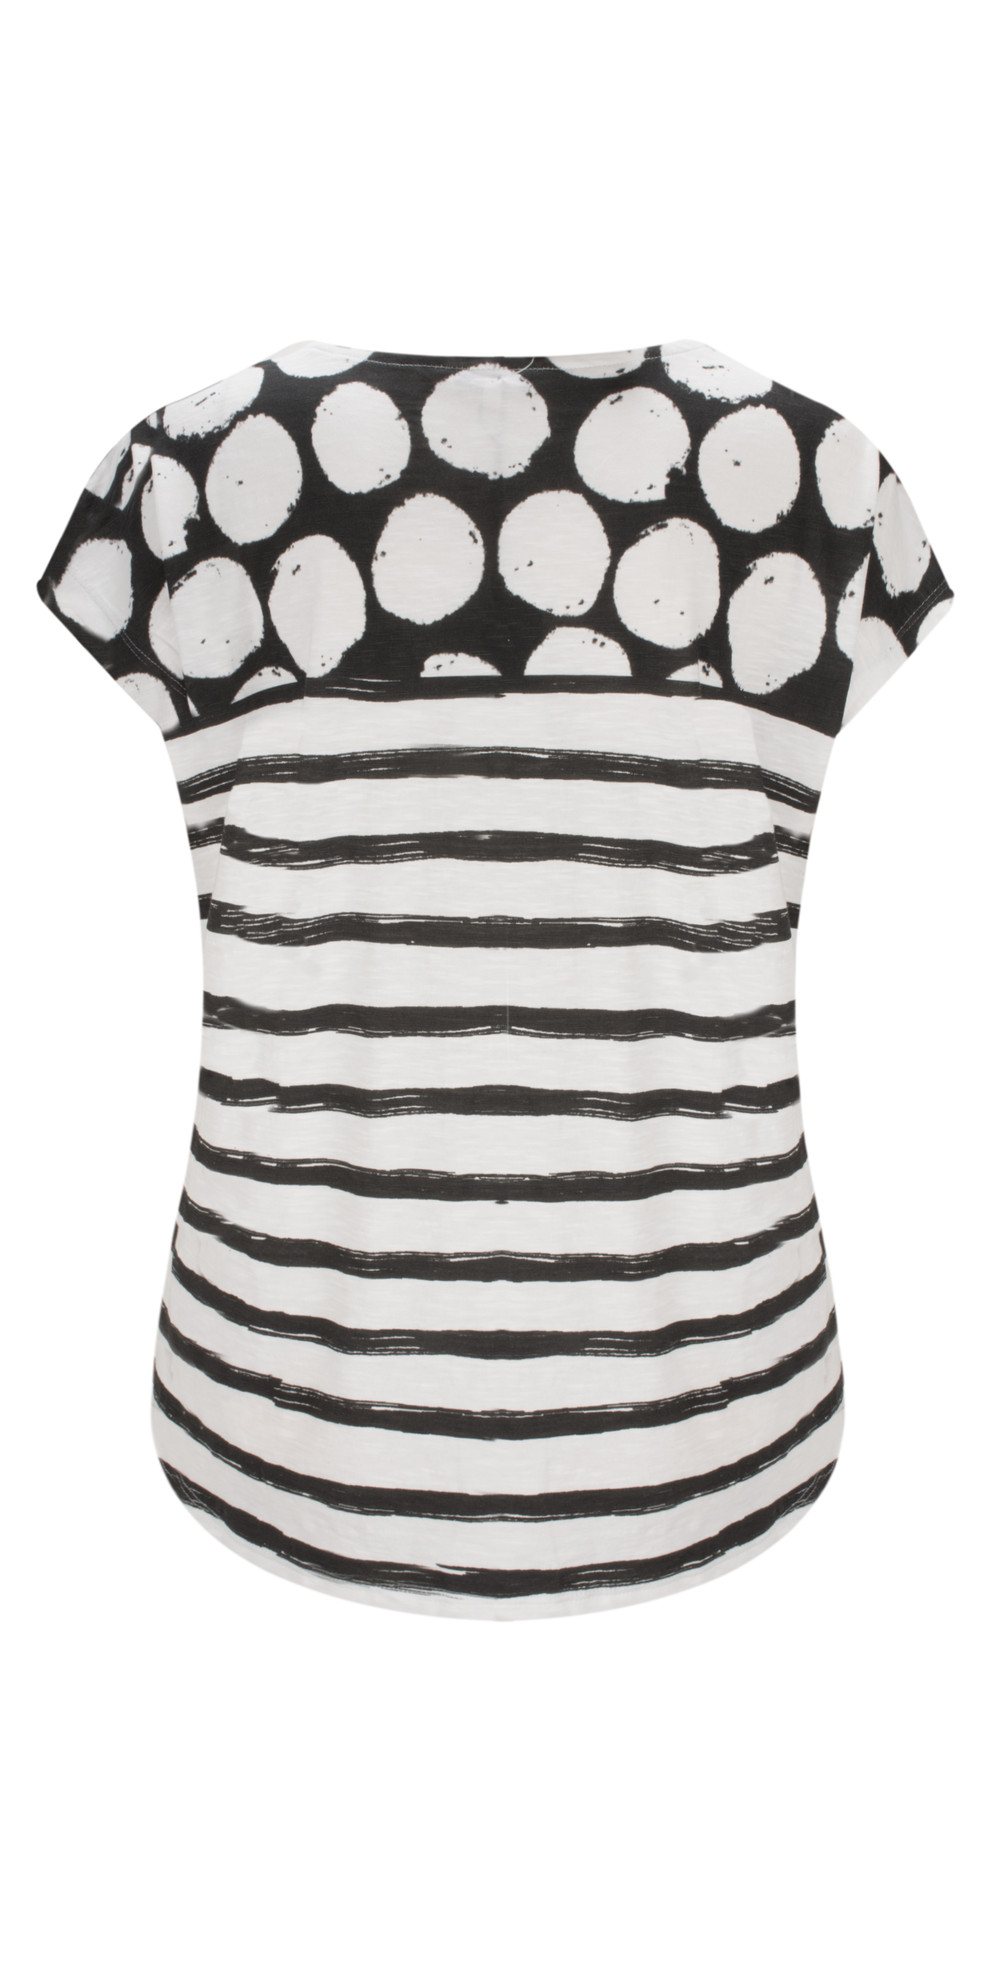 Patterned Jersey T-shirt main image